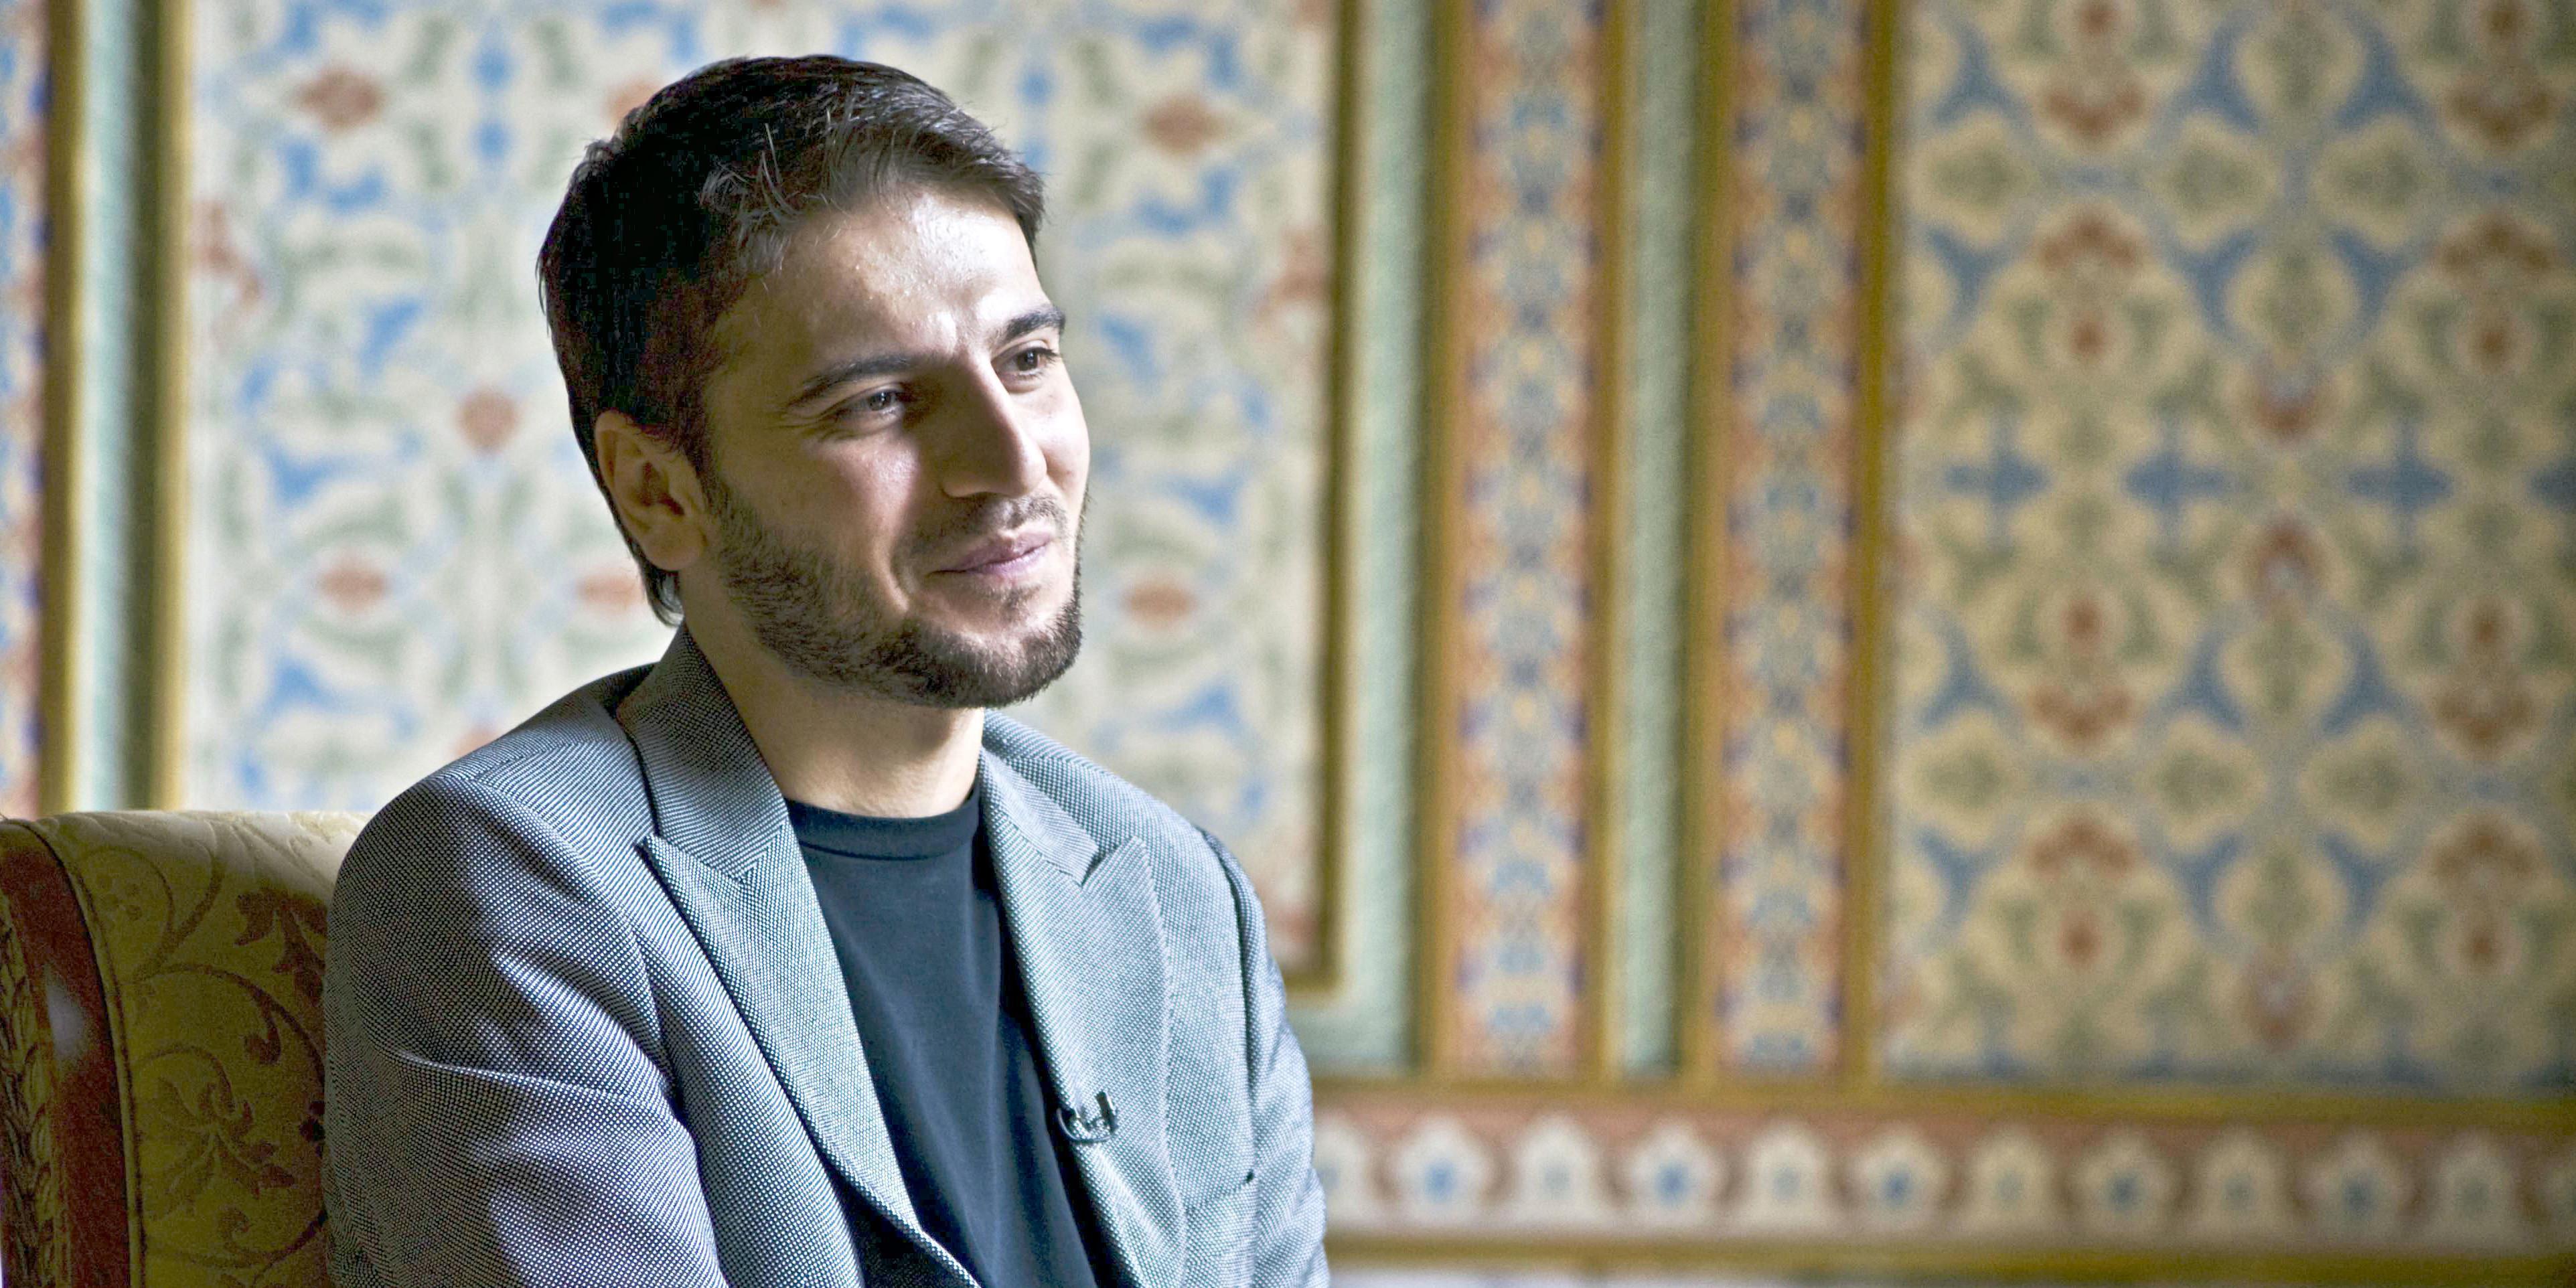 Singer with Azeri origin has become the special envoy of the UN